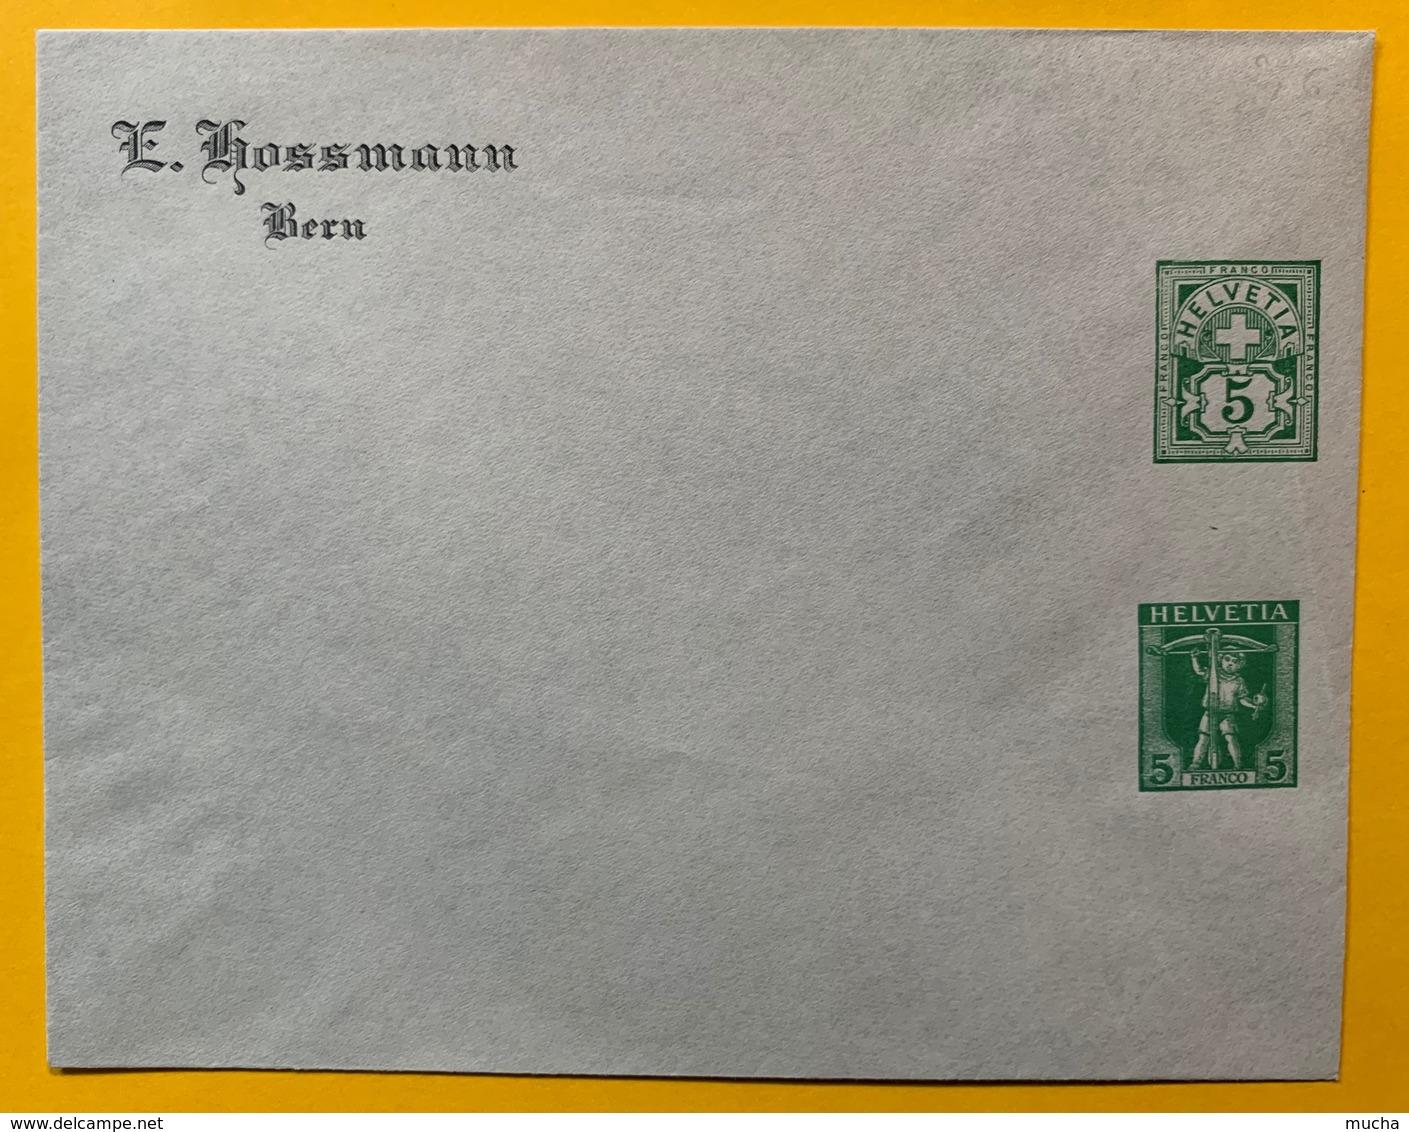 9796 -  Enveloppe Privée E Hossmann  5 Ct 5 Ct  Neuve - Entiers Postaux